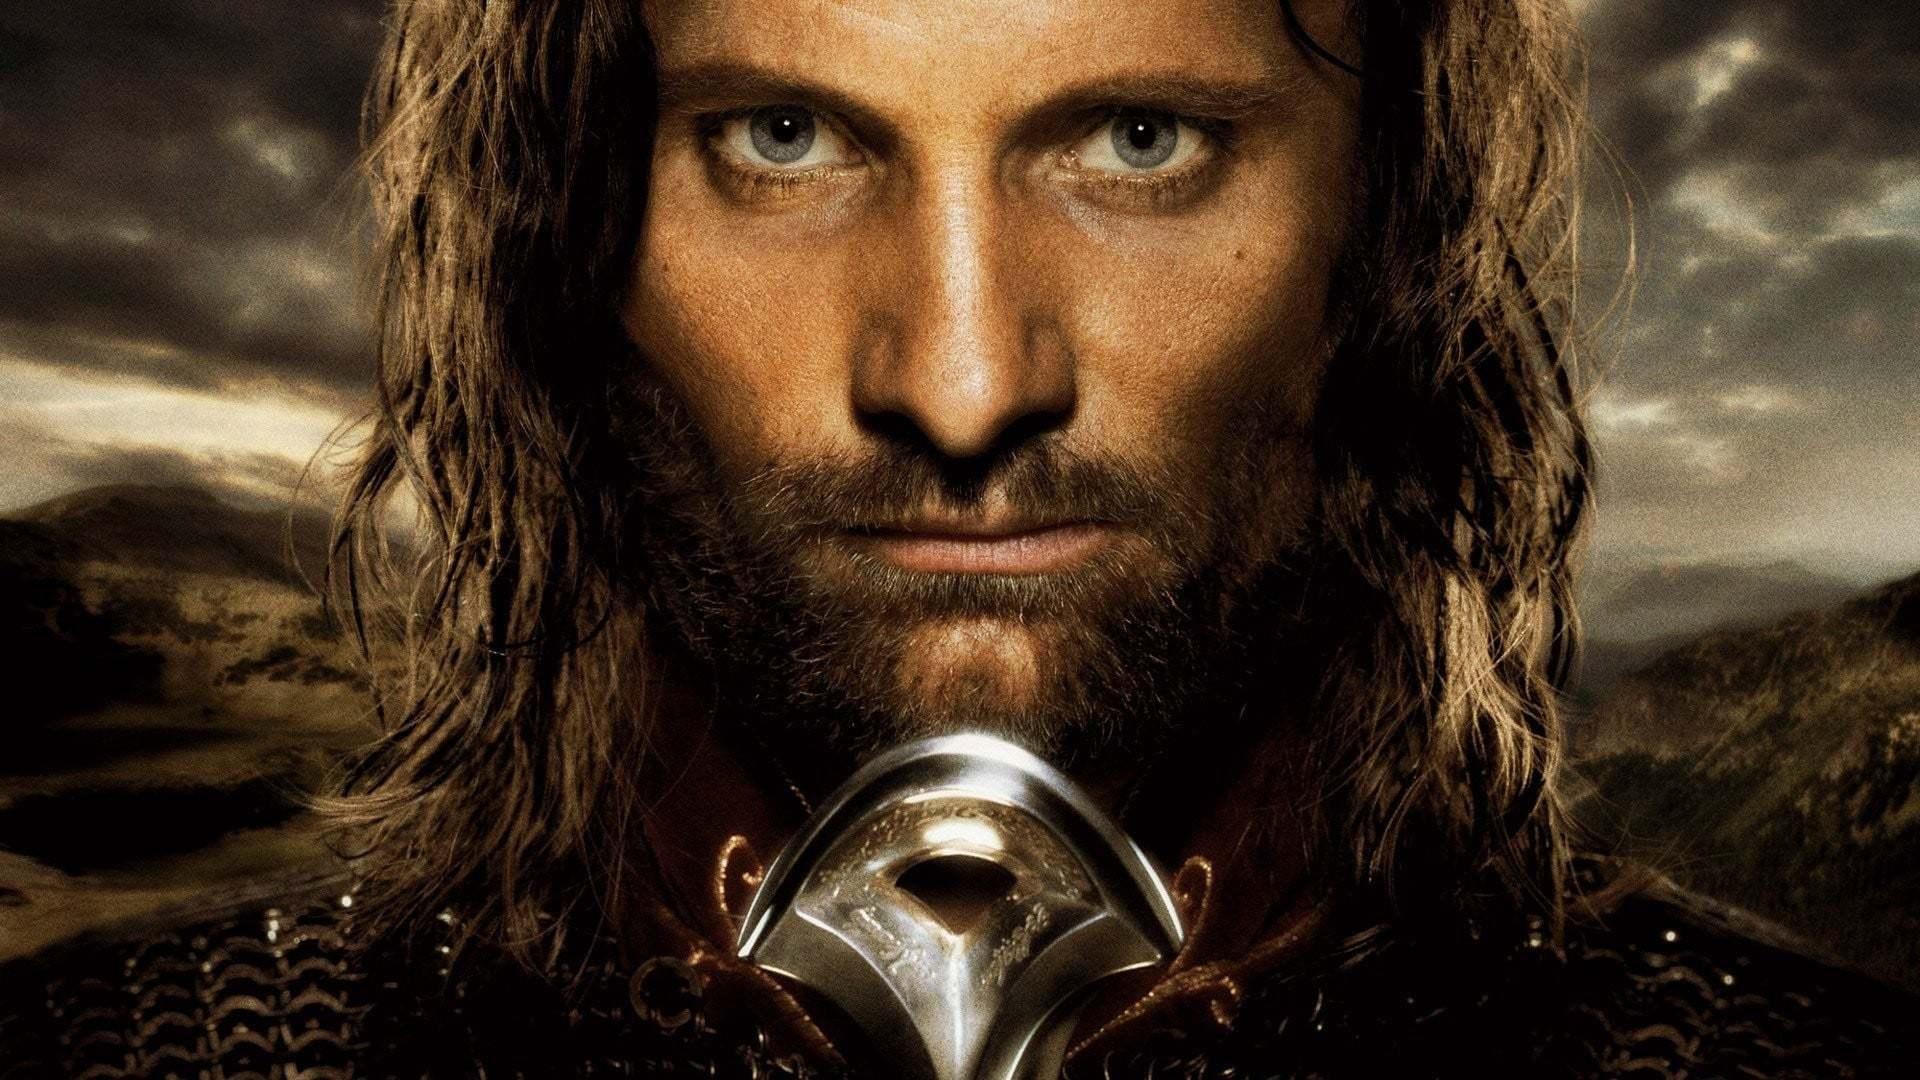 Кадры из фильма Властелин колец: Возвращение Короля The Lord of the Rings: The Return of the King 2003